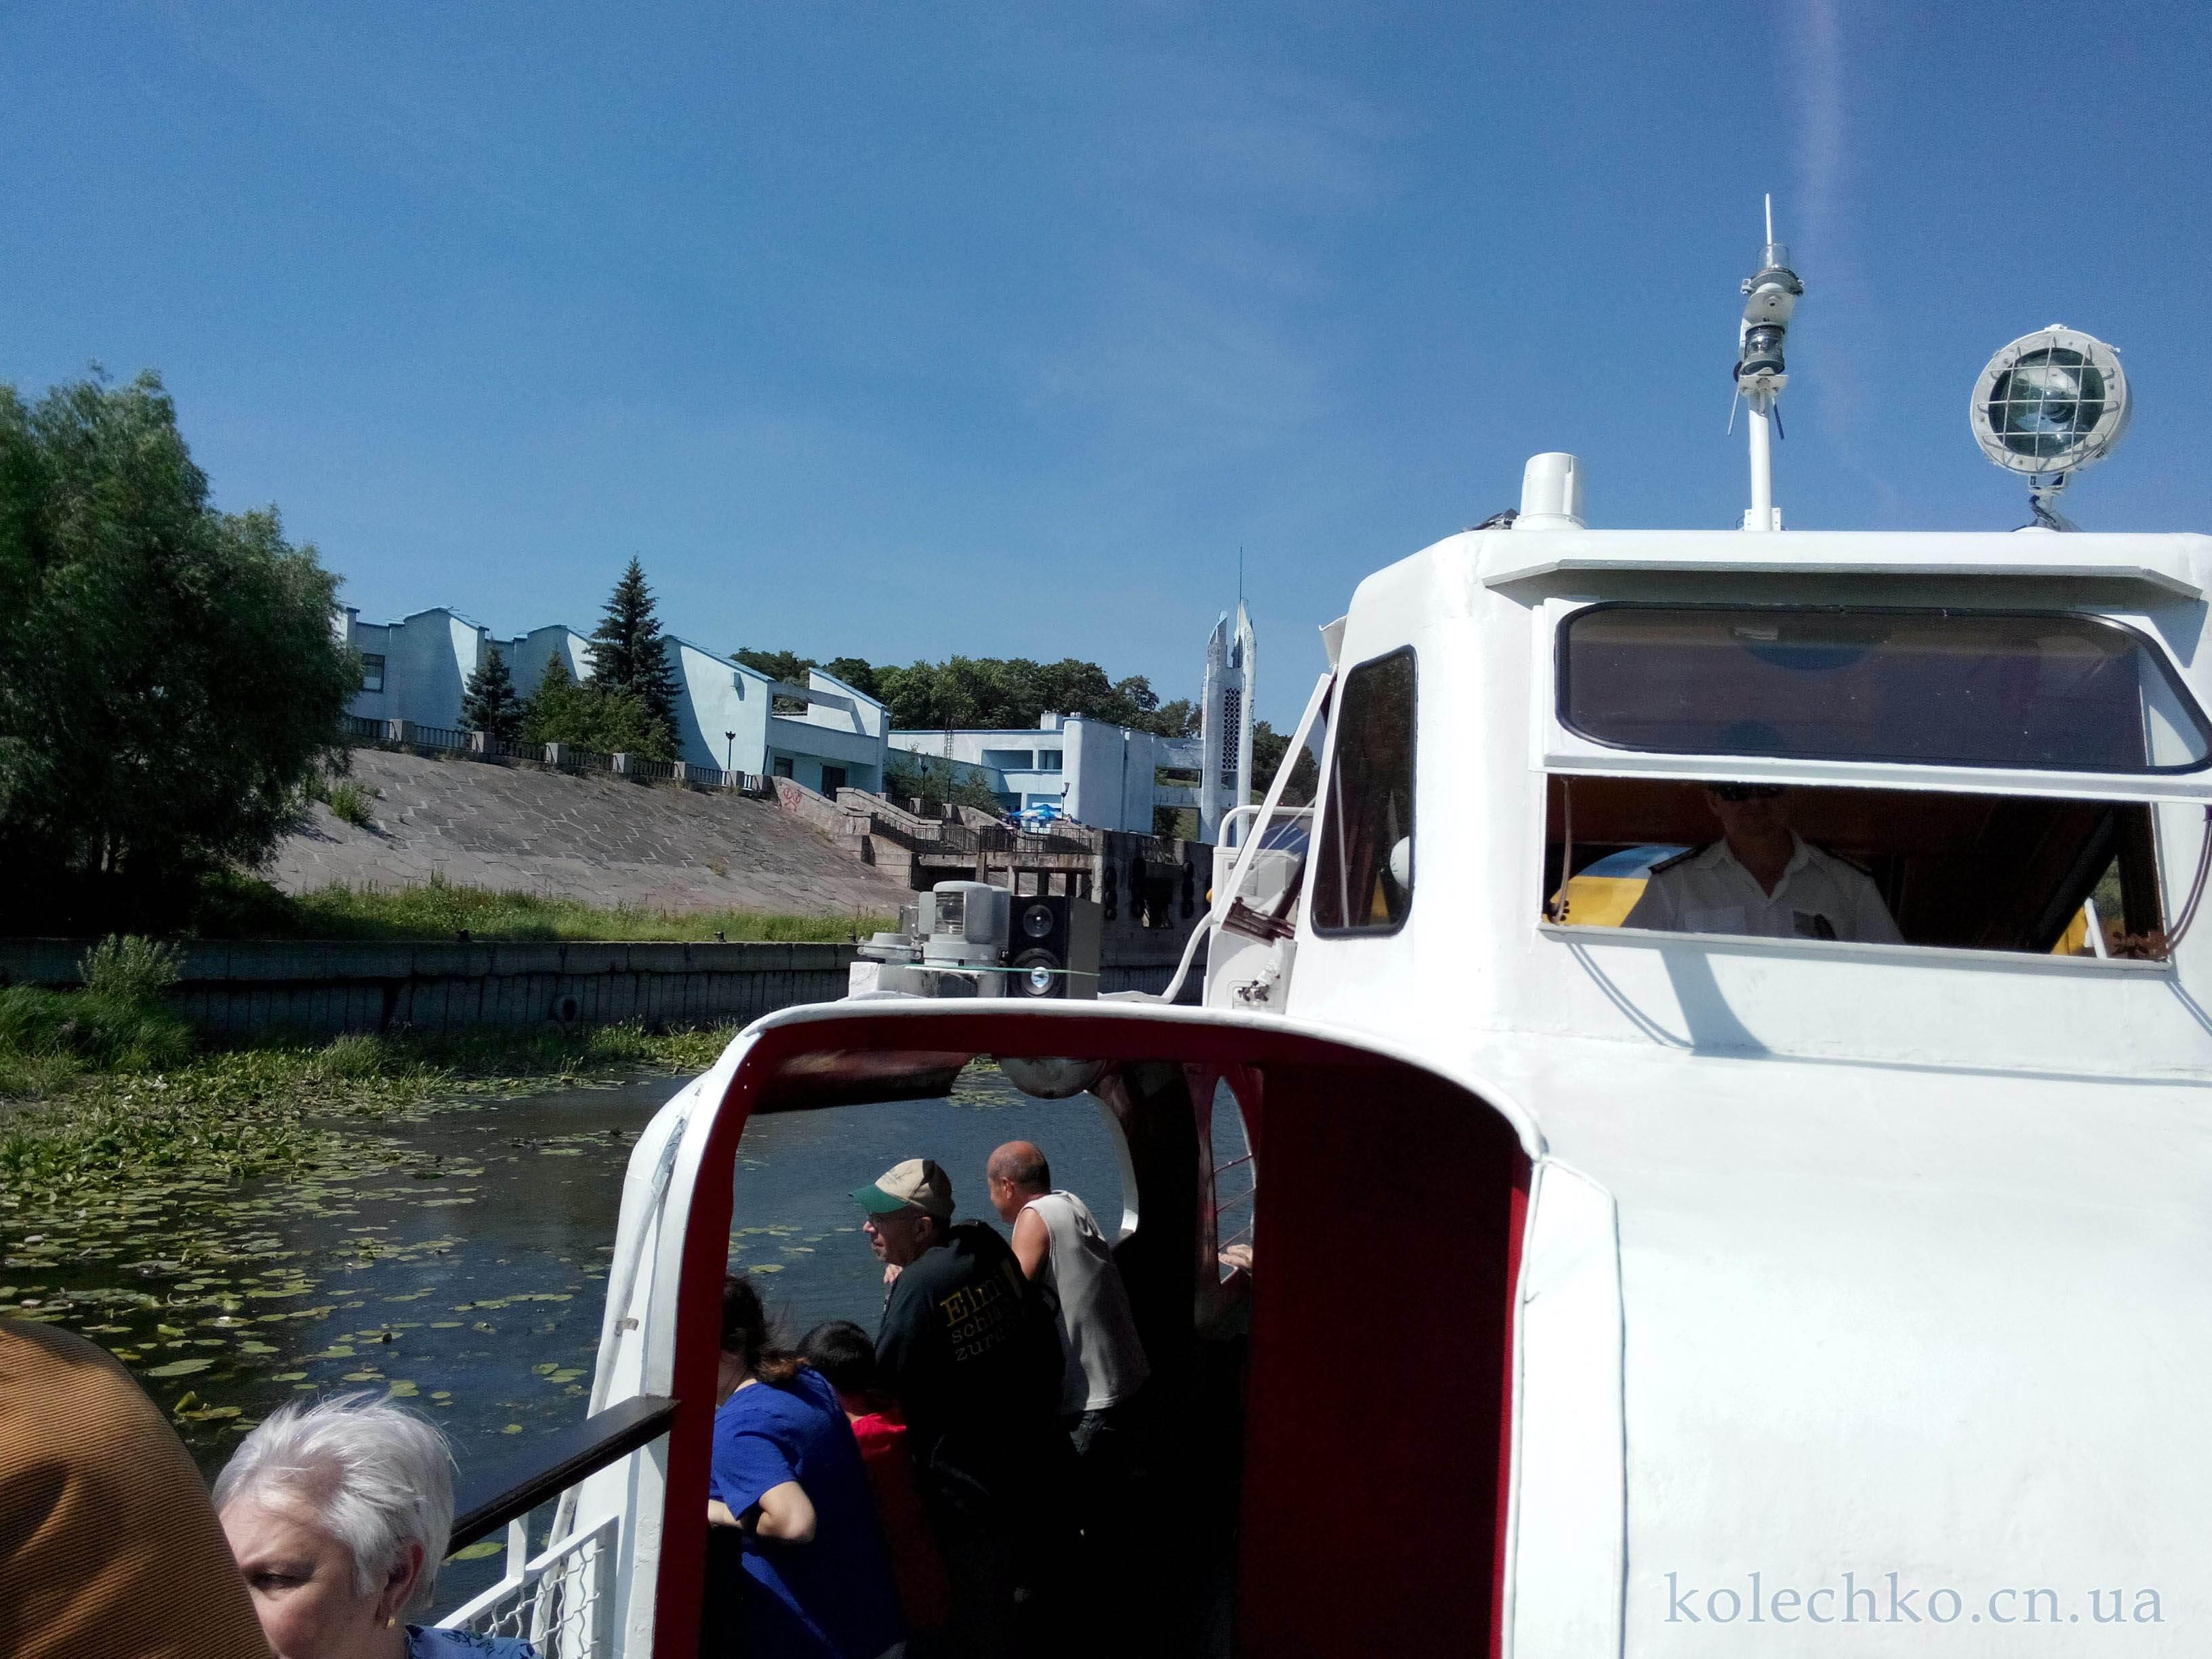 выход на катере с порта Чернигова